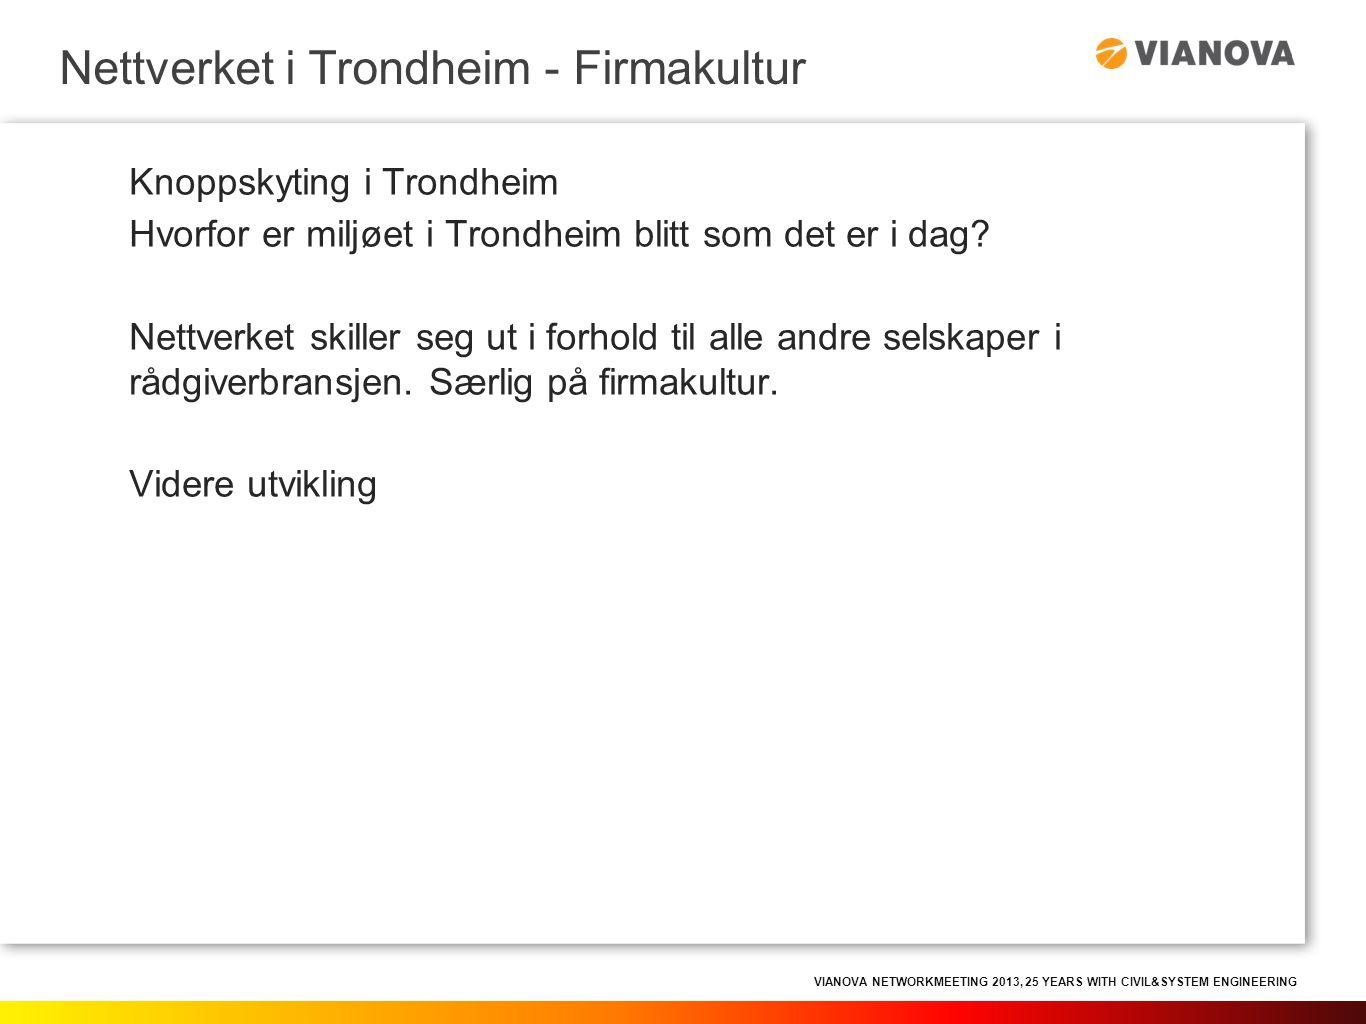 VIANOVA NETWORKMEETING 2013, 25 YEARS WITH CIVIL&SYSTEM ENGINEERING Status Trondheim vinteren 2010: • Aas-Jakobsen Trondheim AS (12) • ViaNova Trondheim AS (1) • ViaNova Systems AS (2) Nettverket i Trondheim - Firmakultur ViaNova Trondheim